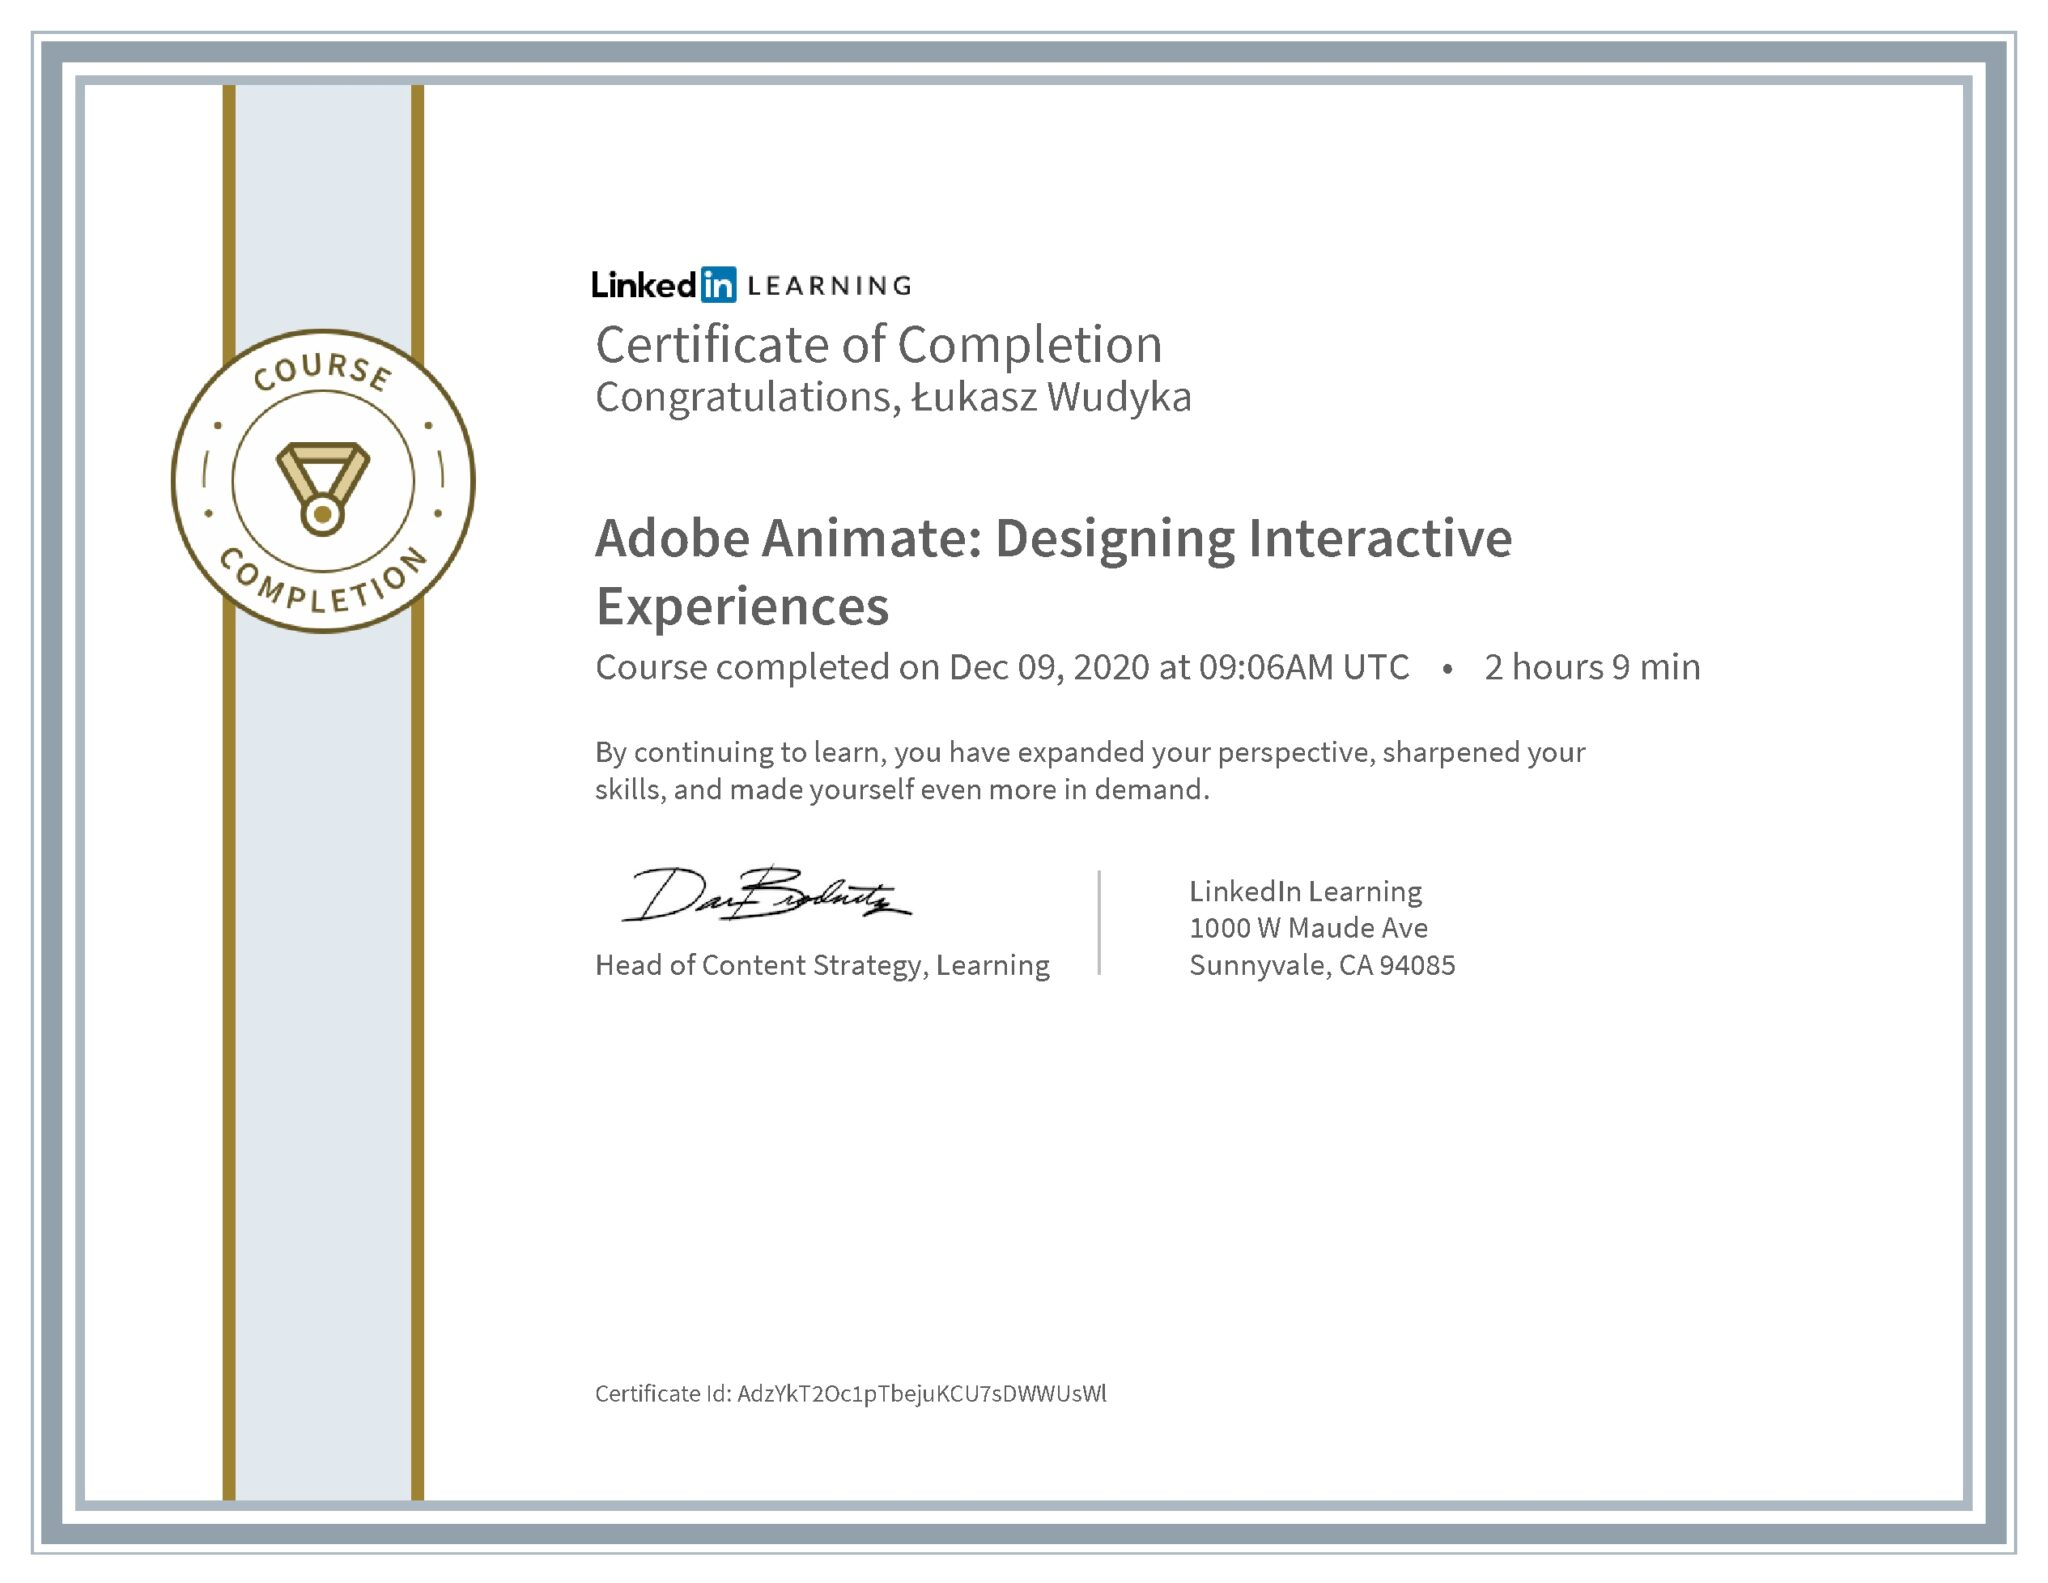 Łukasz Wudyka certyfikat LinkedIn Adobe Animate: Designing Interactive Experiences